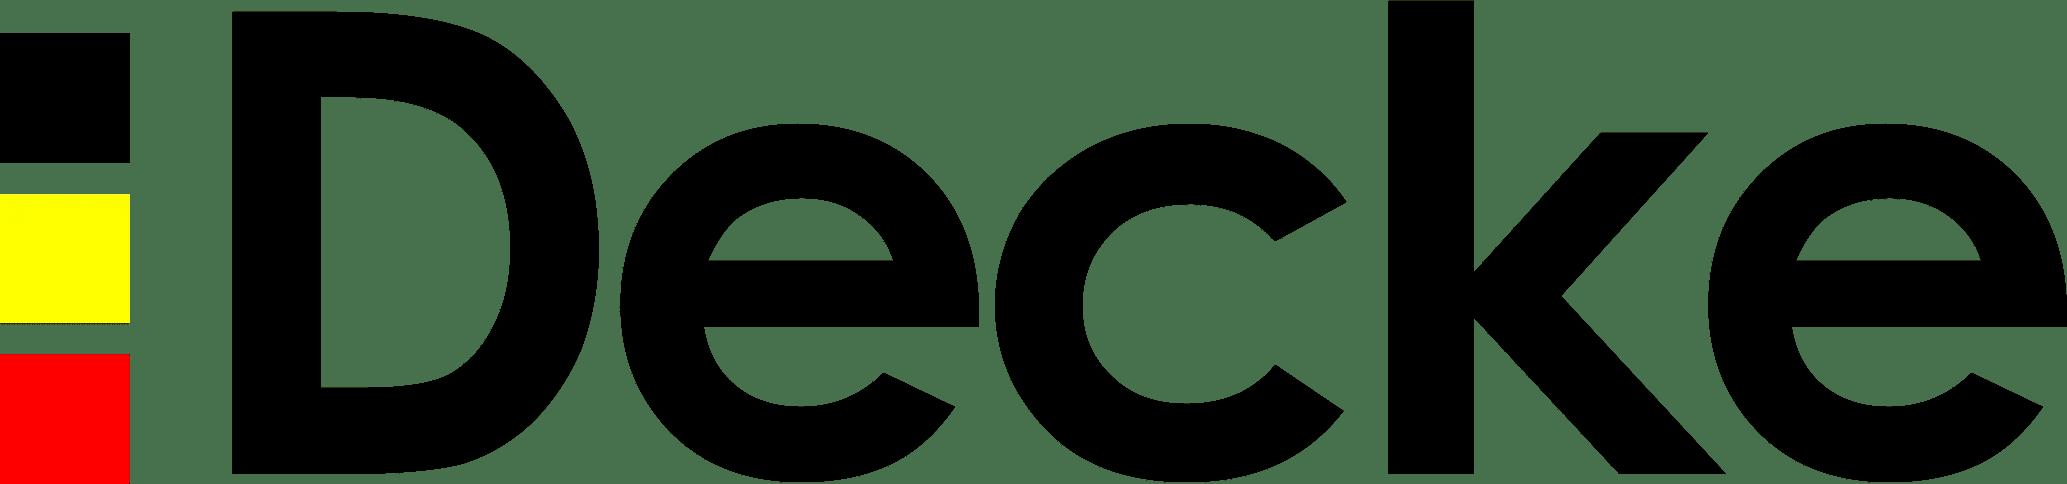 logo Decke.uz